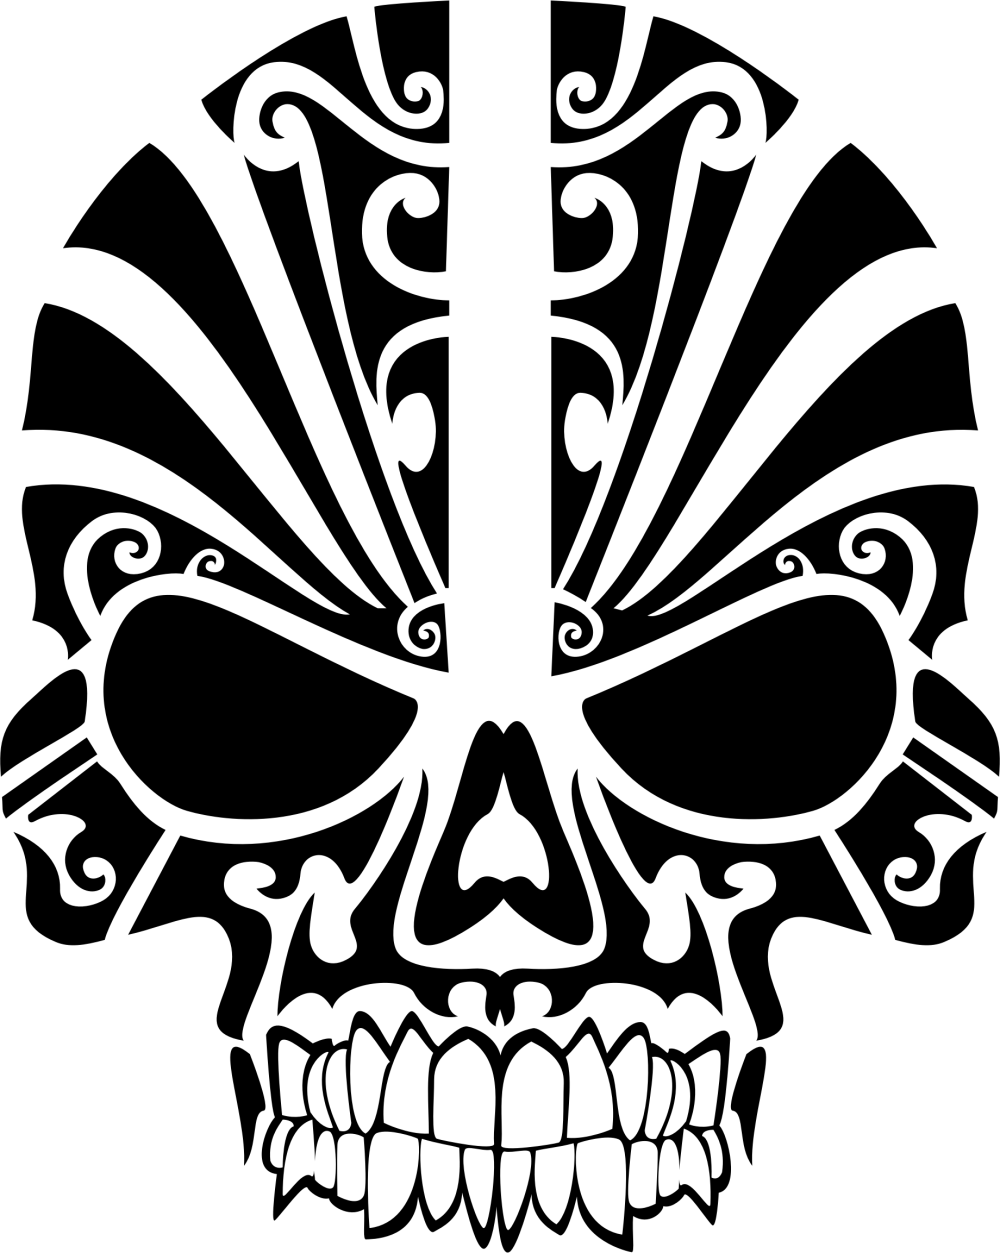 medium resolution of download clipart t shirt logo skull axe free clipart hd 95